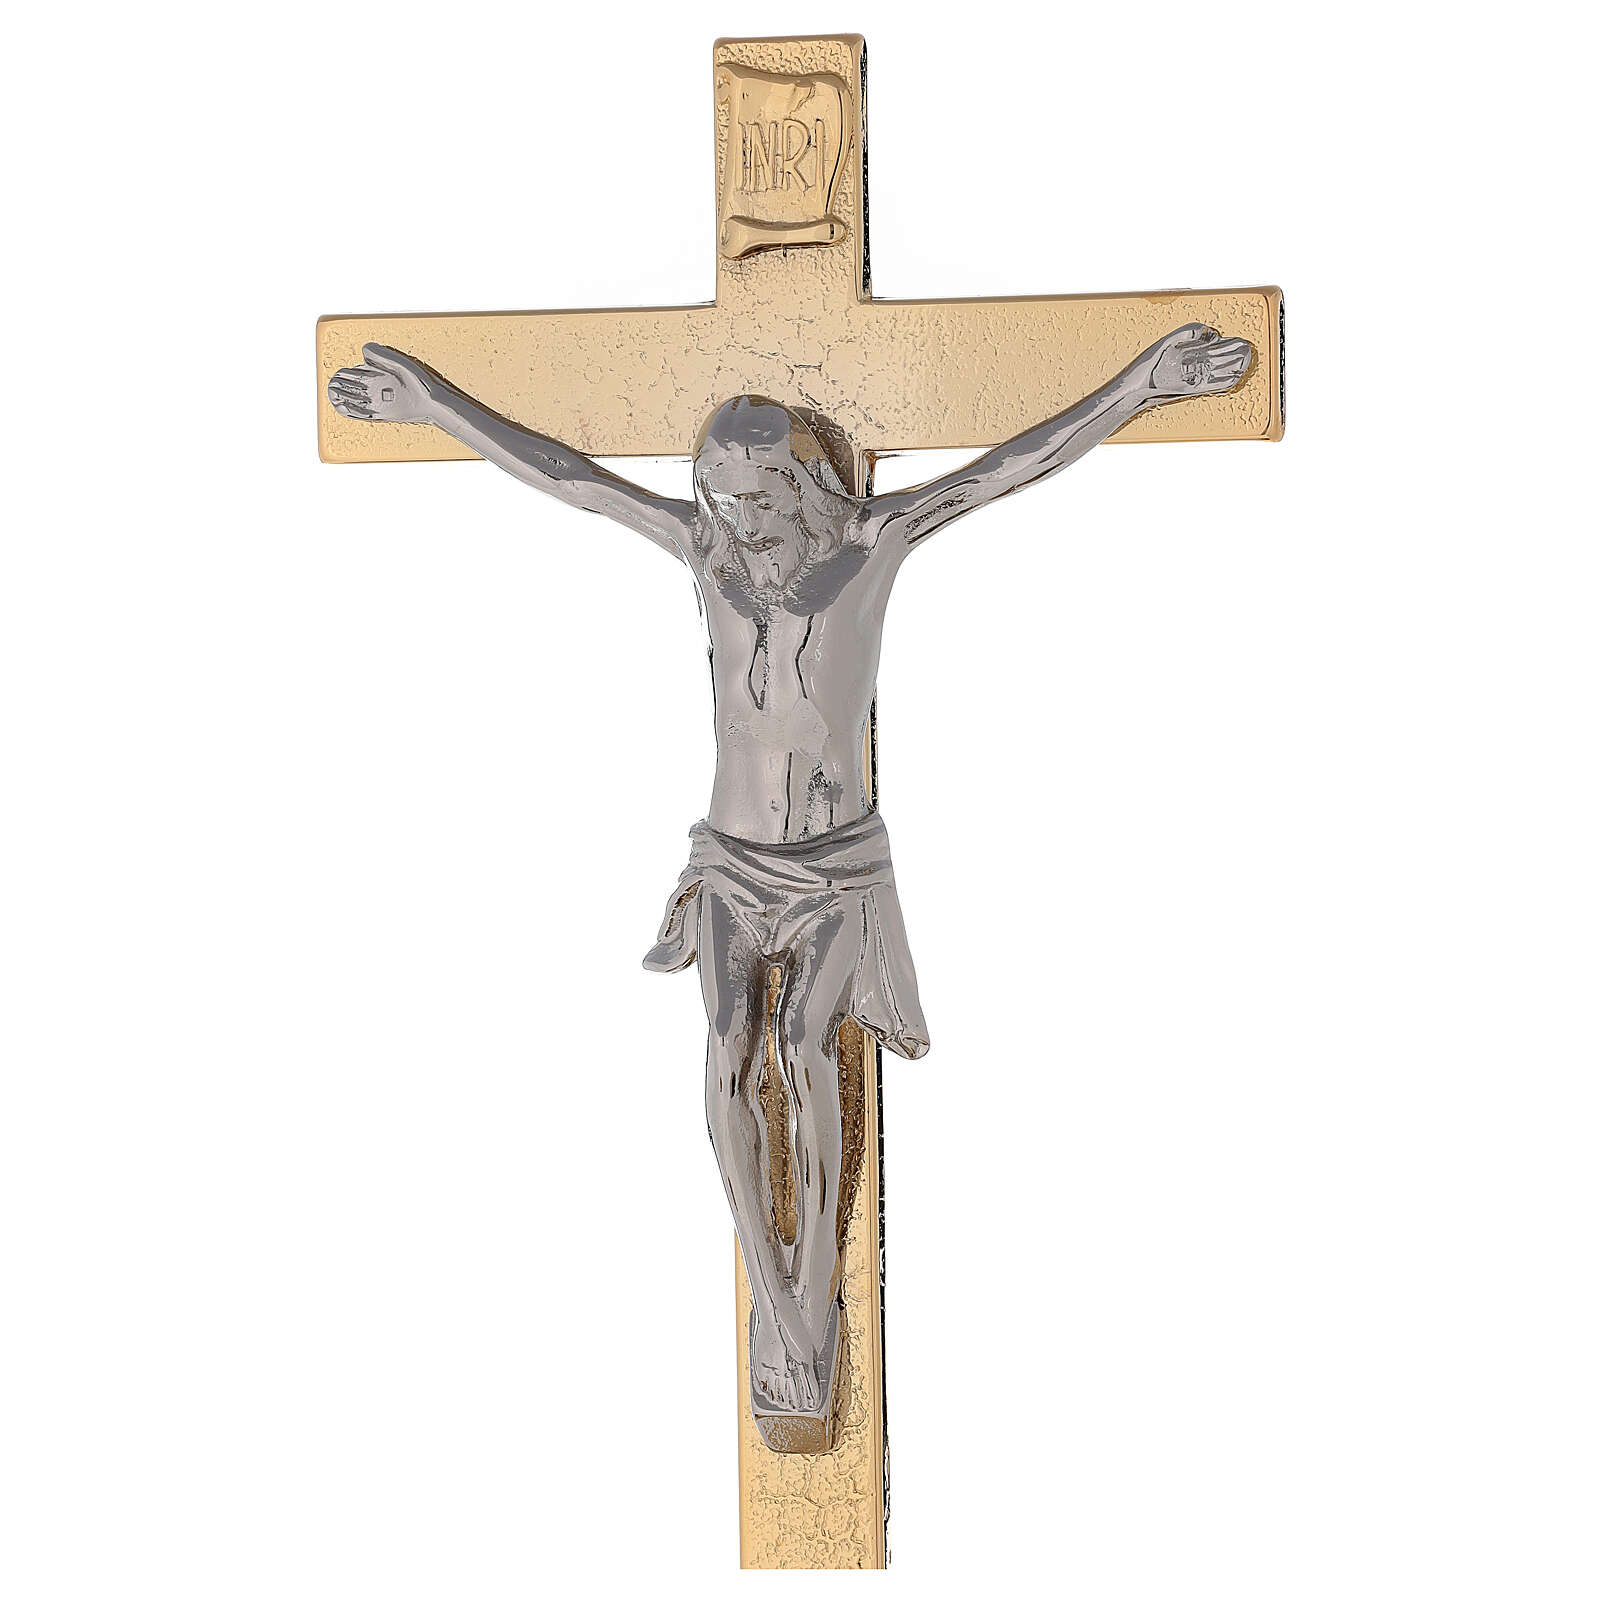 Croce altare su base ottone dorato 24k nodo spighe candelieri 4